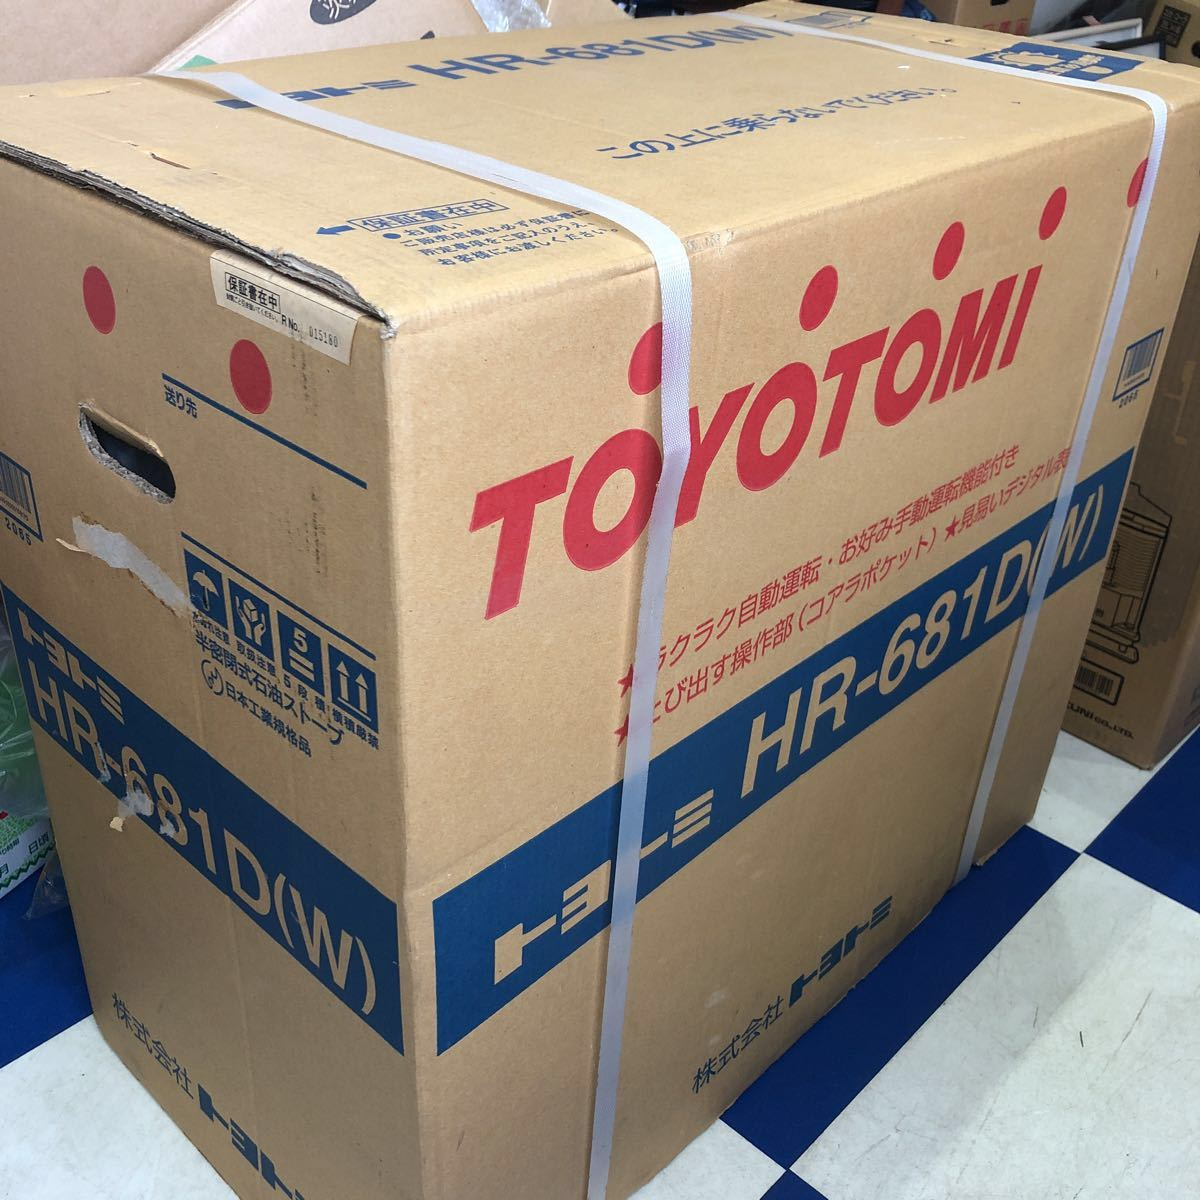 TOYOTOMI トヨトミ HR-681D ホワイト 半密閉式ストーブ 未使用★2631